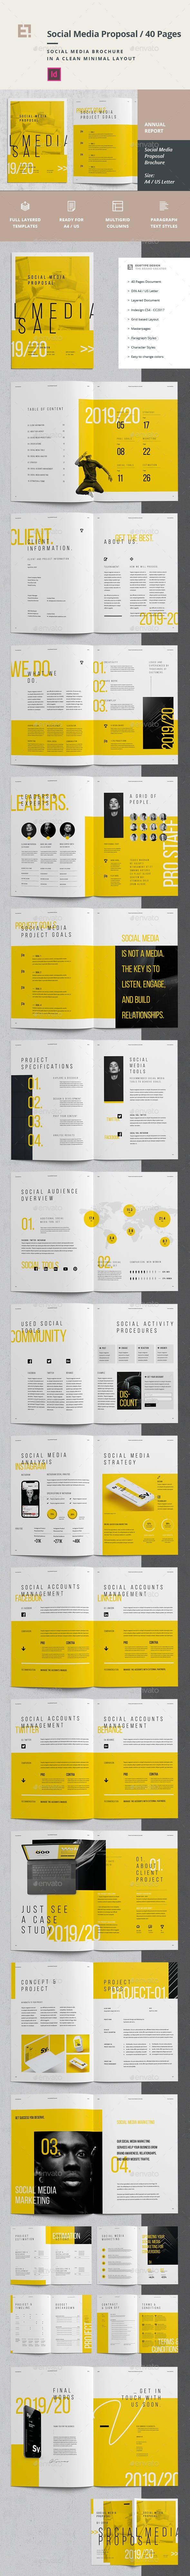 Social Media Proposal #8 5x11 #cloud | Layout design | Brand manual